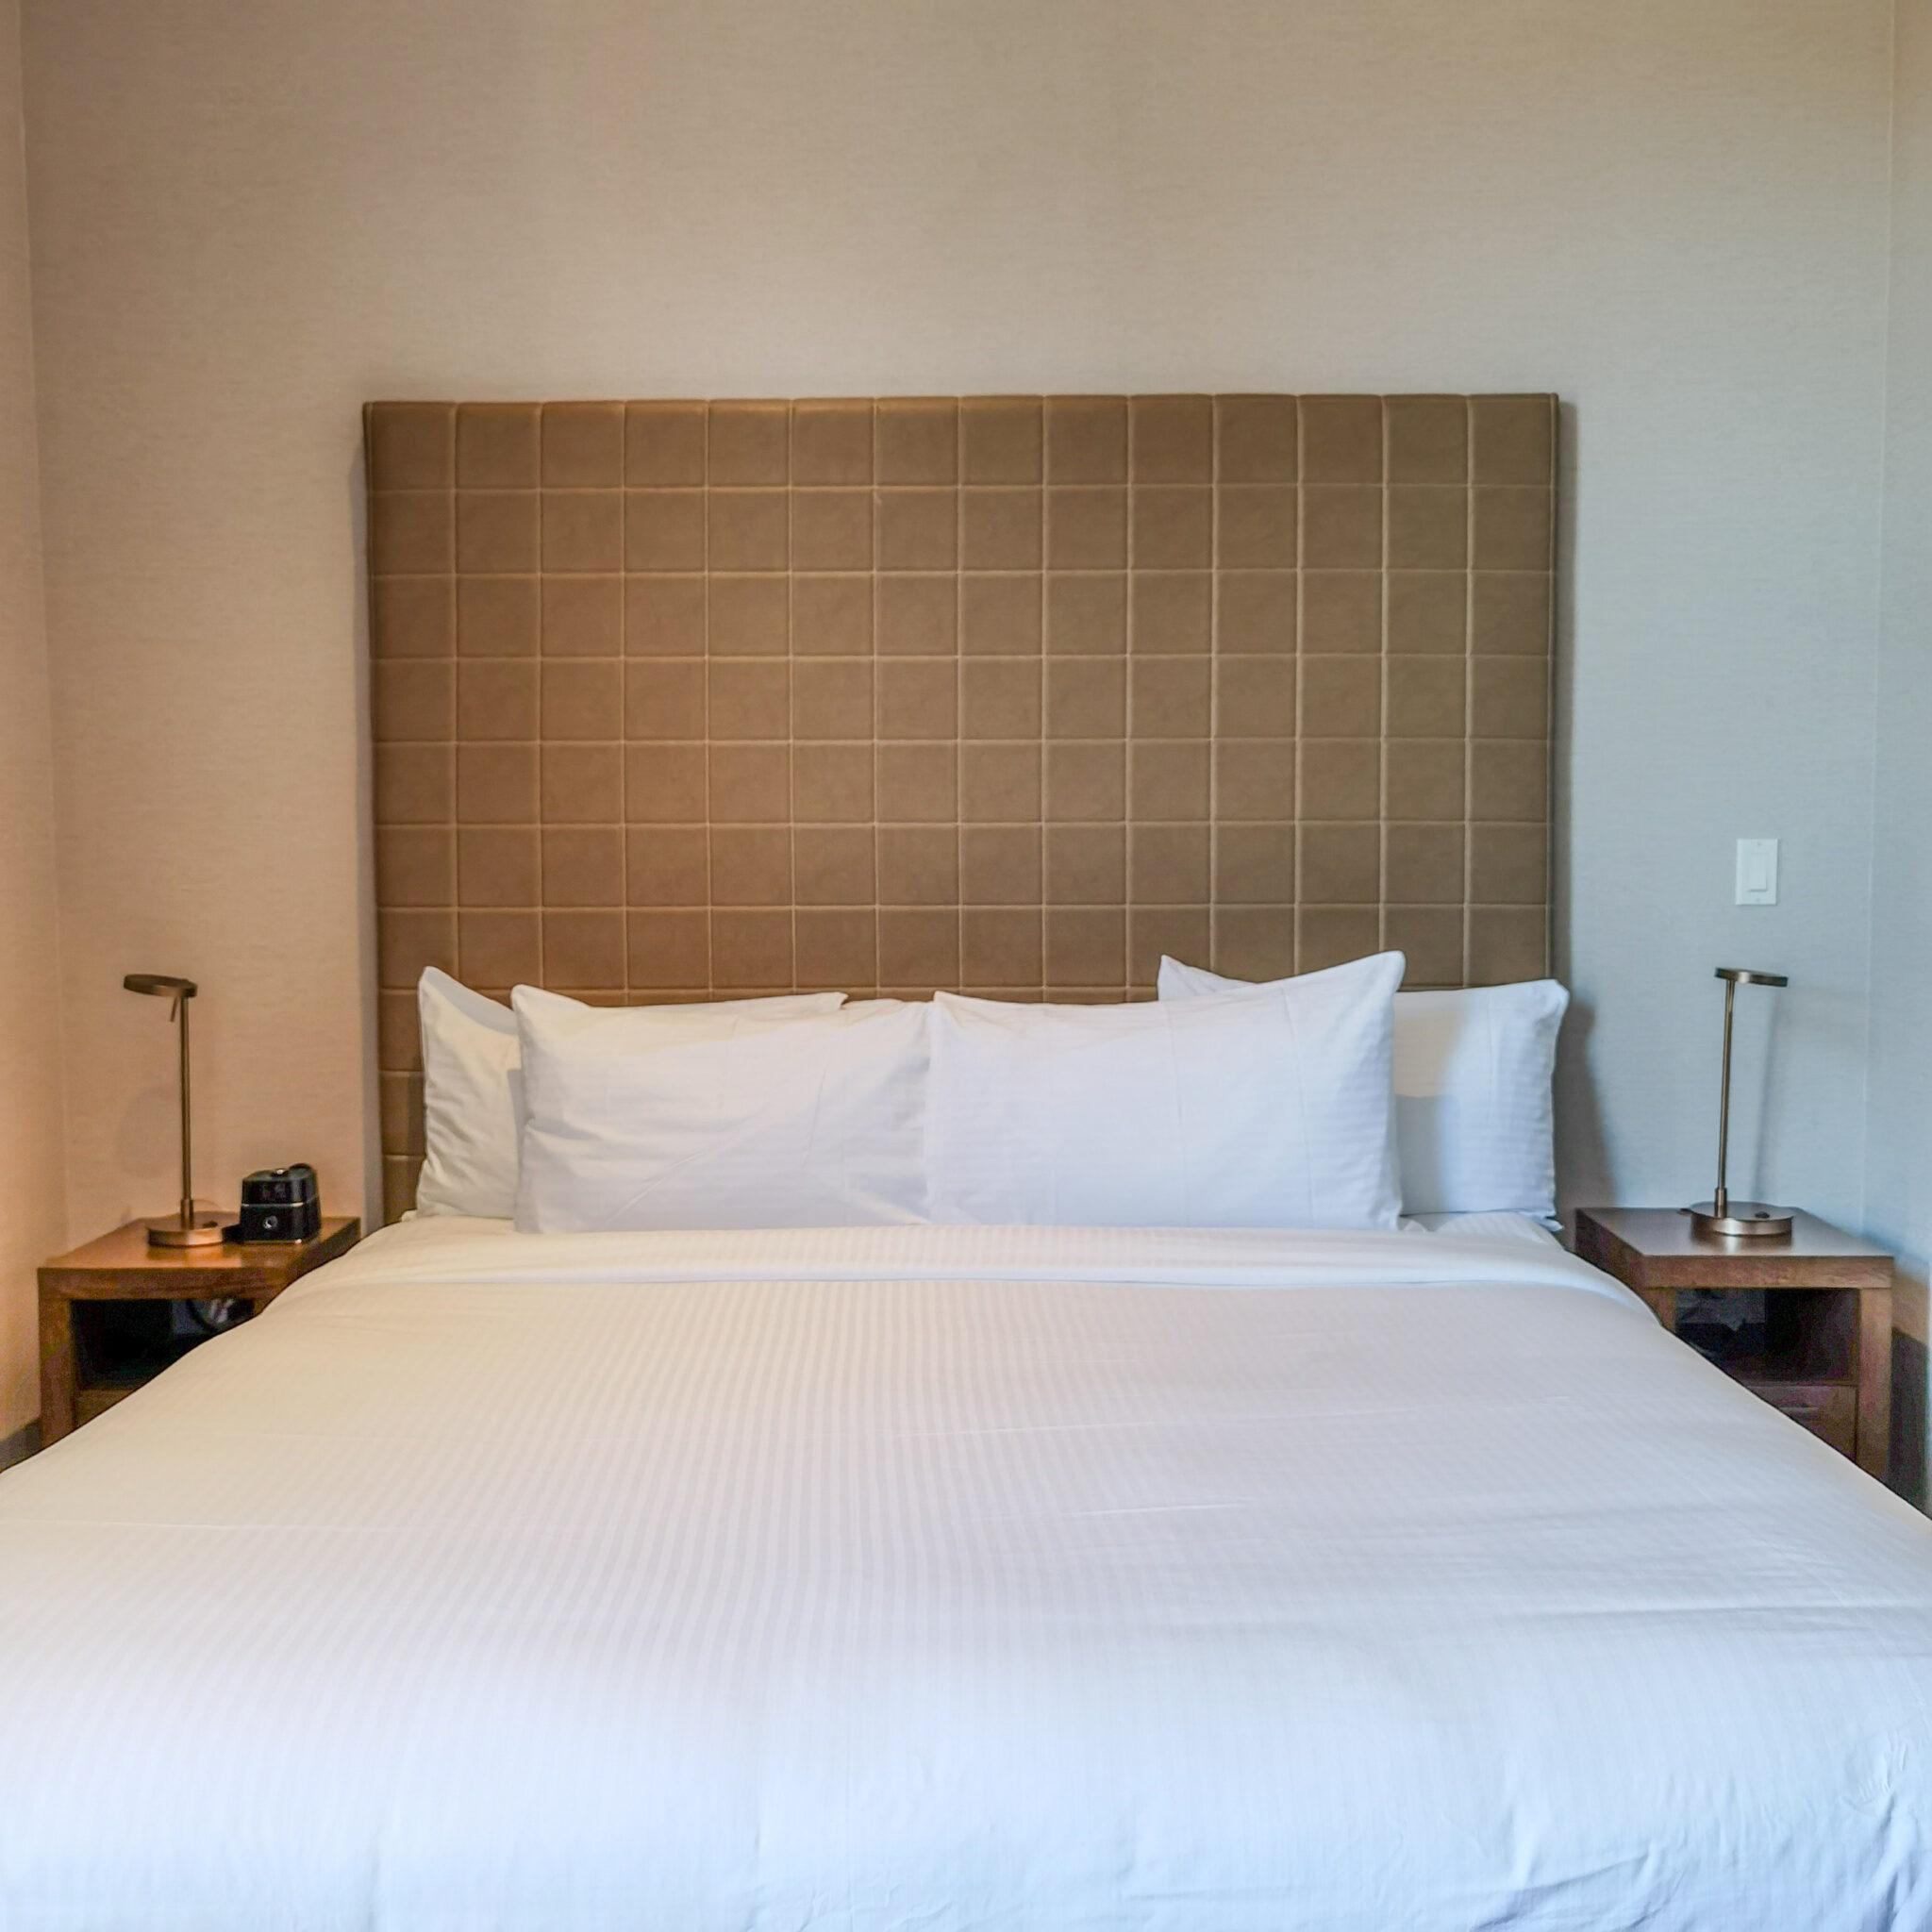 Hotel Malcolm Canmore Alberta - Canadian Rockies - Room Interior